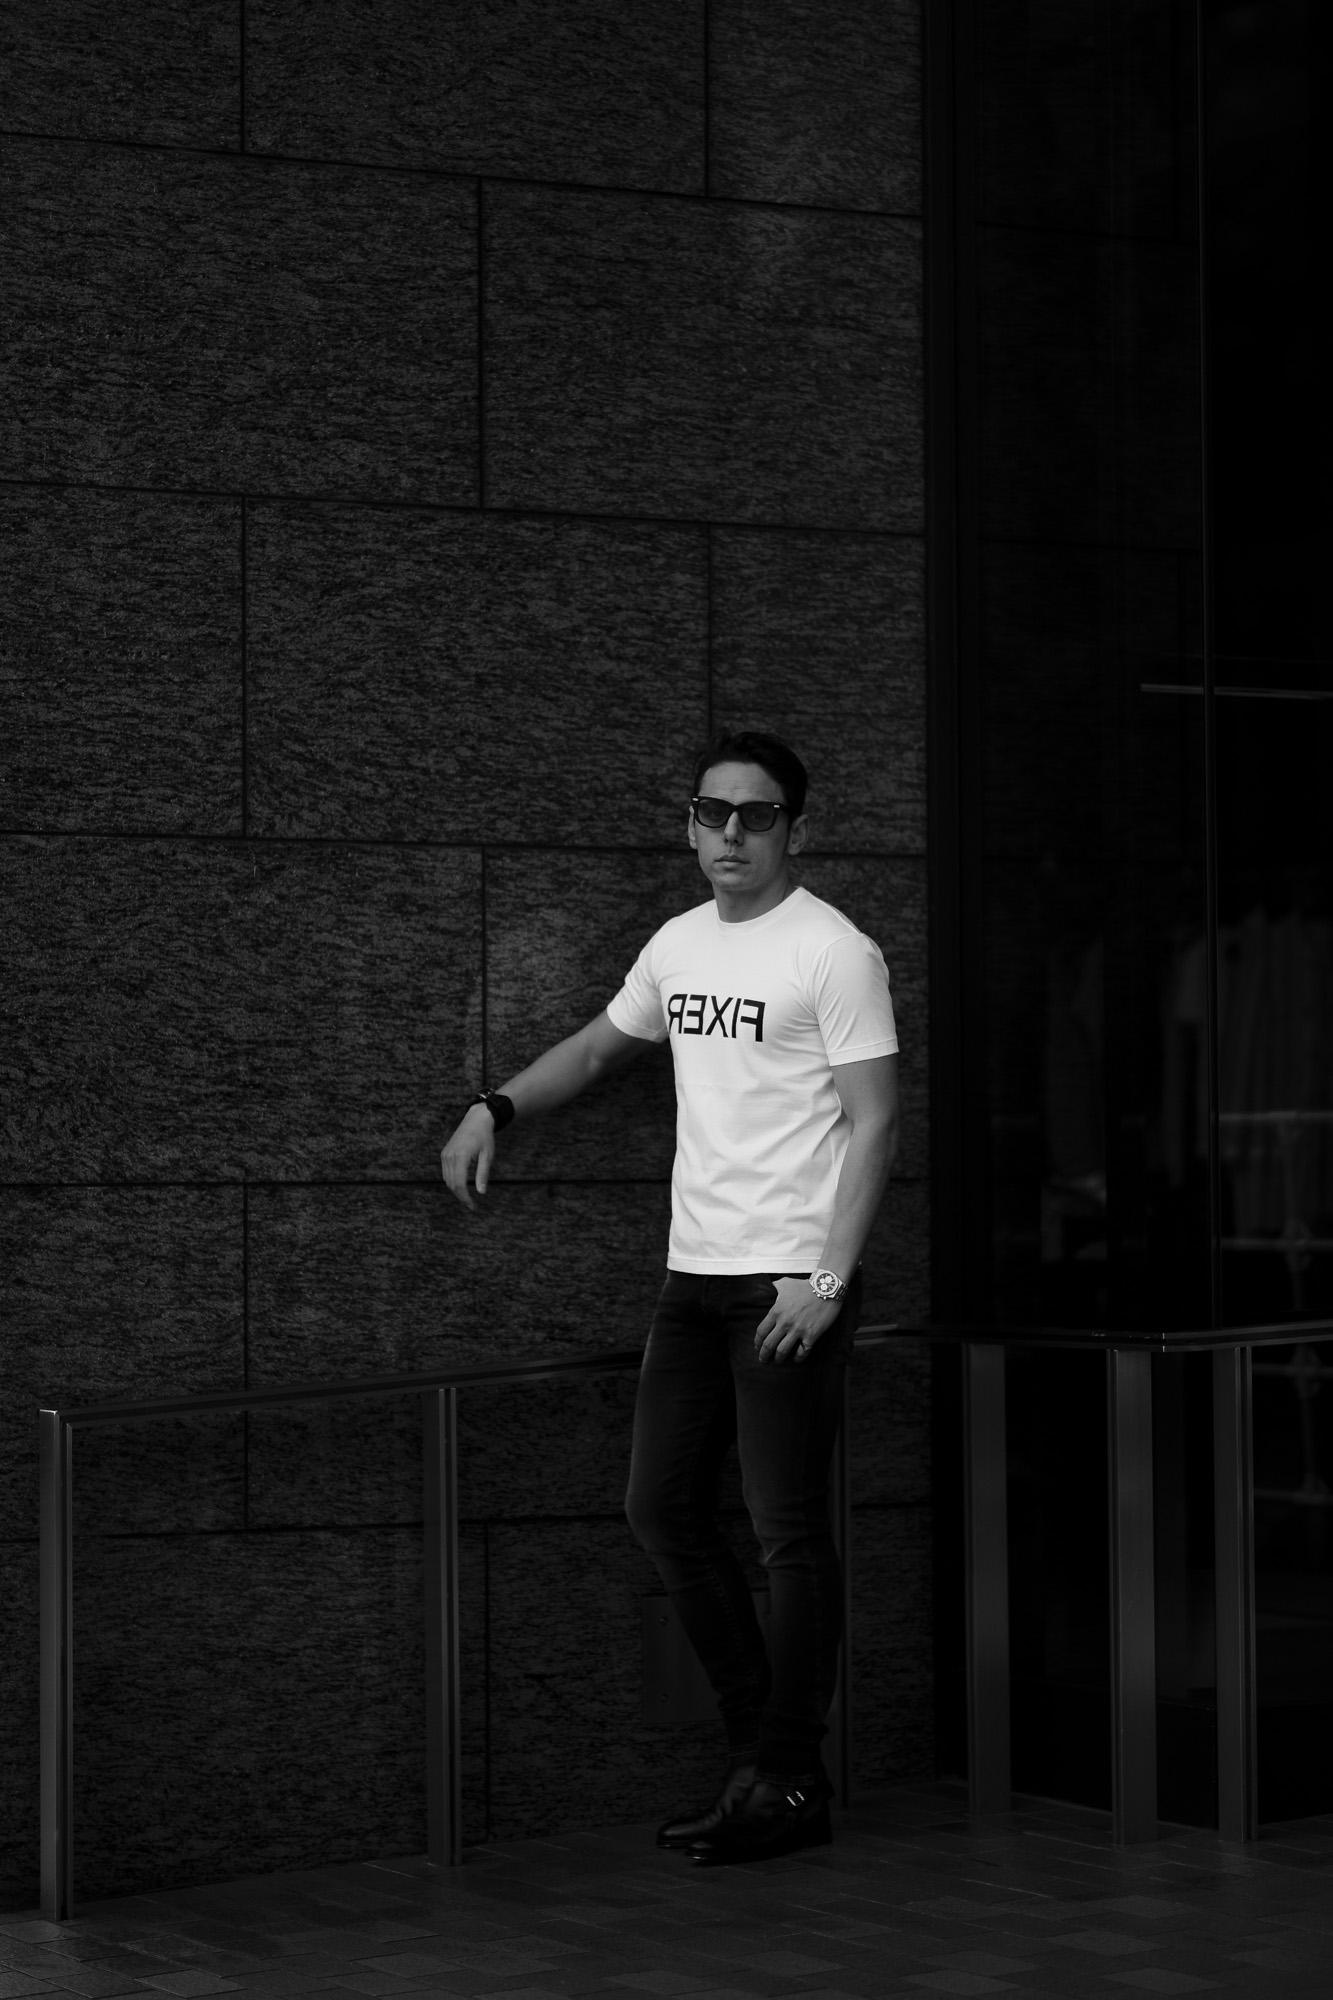 FIXER (フィクサー) FTS-03 Reverse Print Crew Neck T-shirt リバースプリント Tシャツ WHITE (ホワイト) 愛知 名古屋 Alto e Diritto altoediritto アルトエデリット Tシャツ